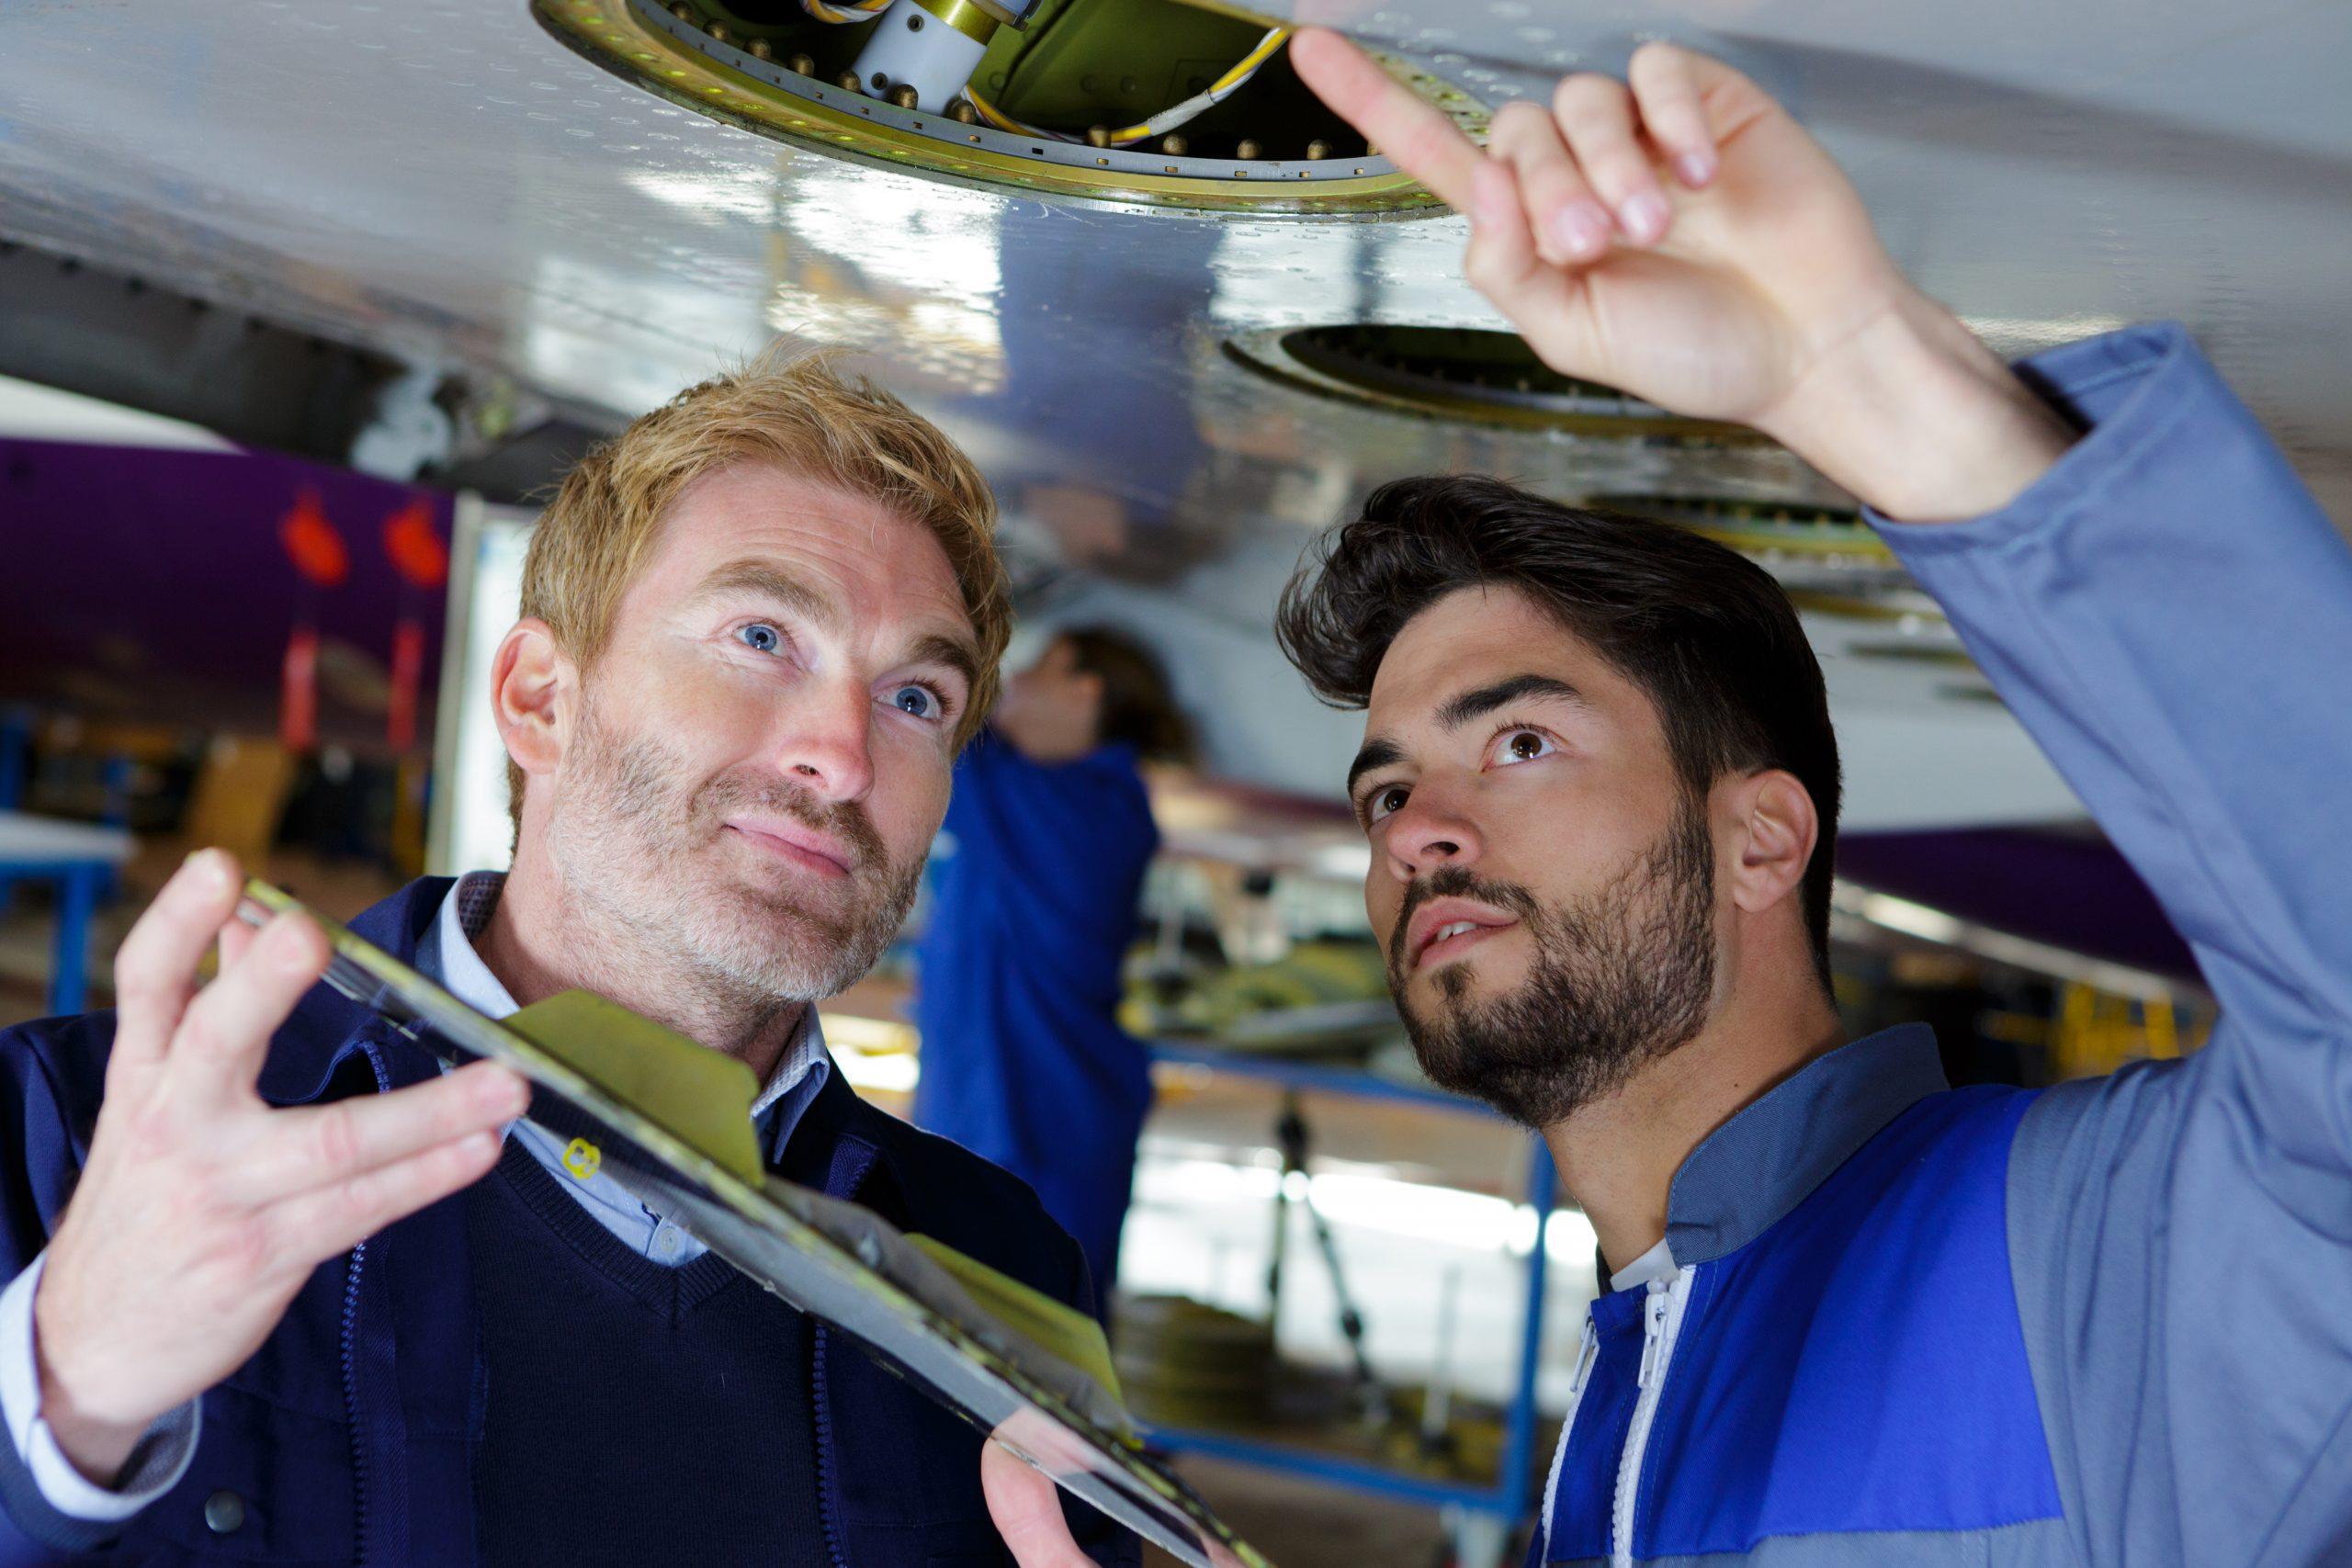 repairmen working on an airplane engine